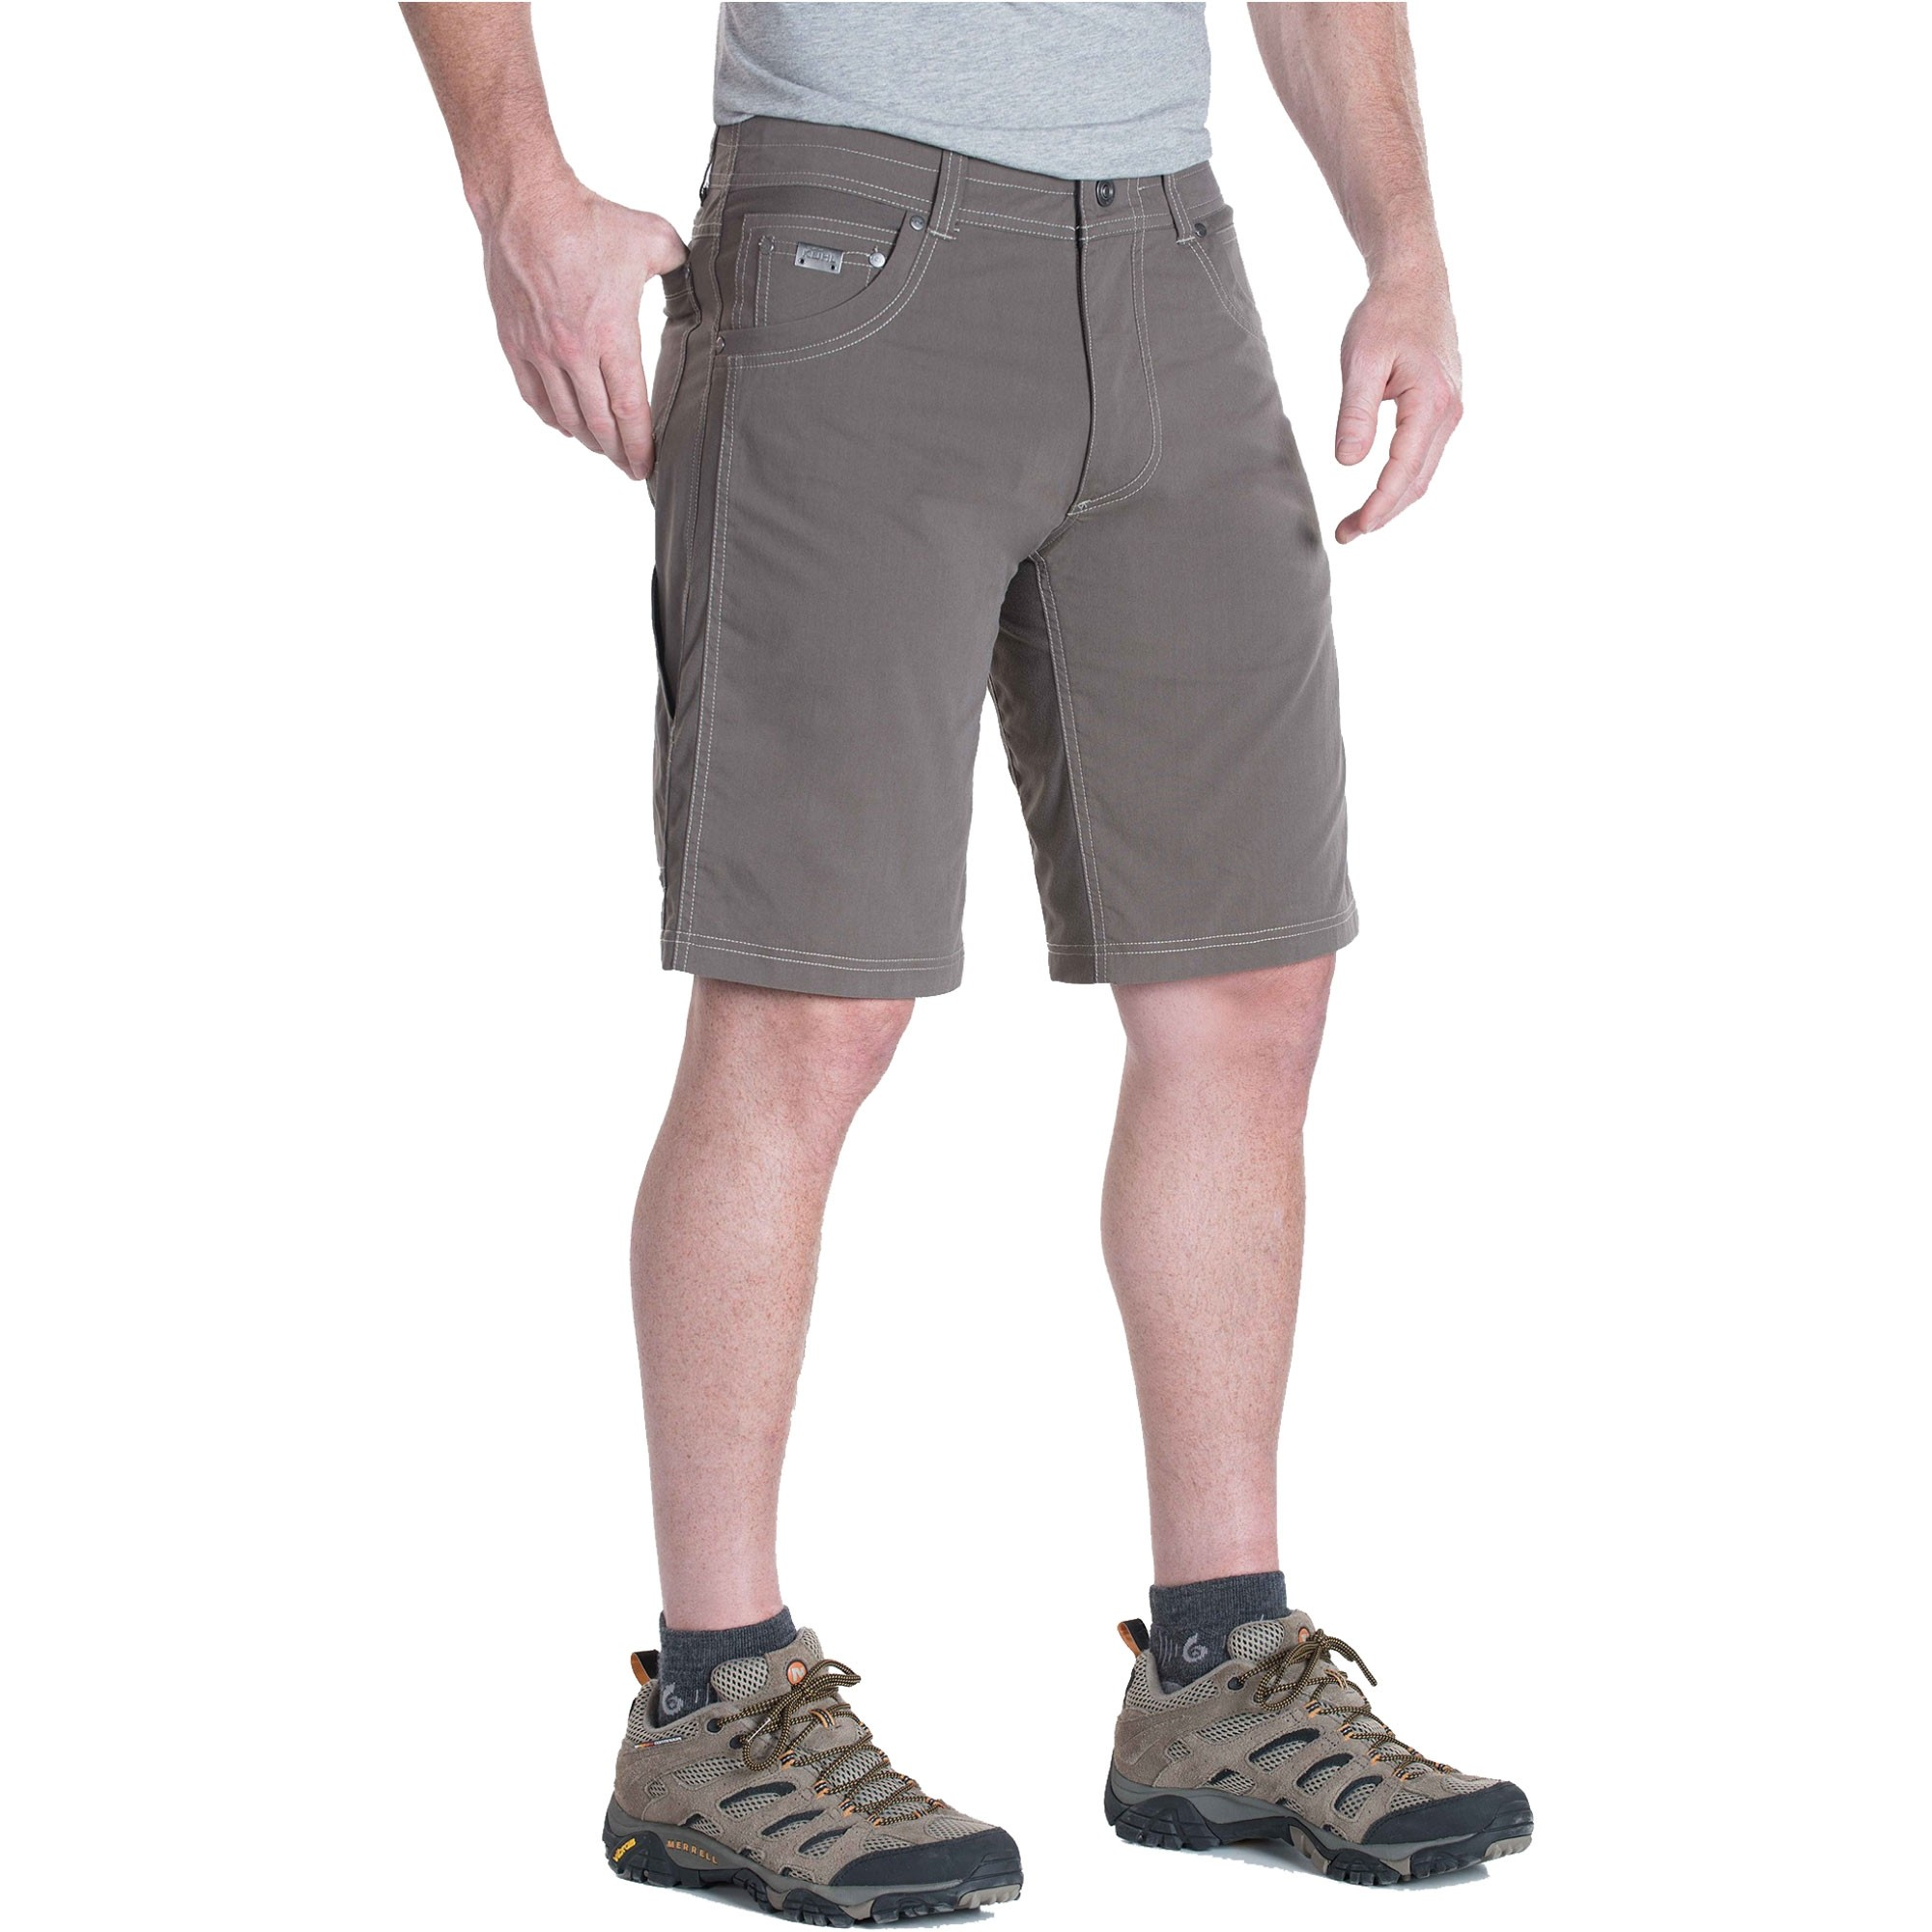 Kuhl Radikl Shorts - Breen - front